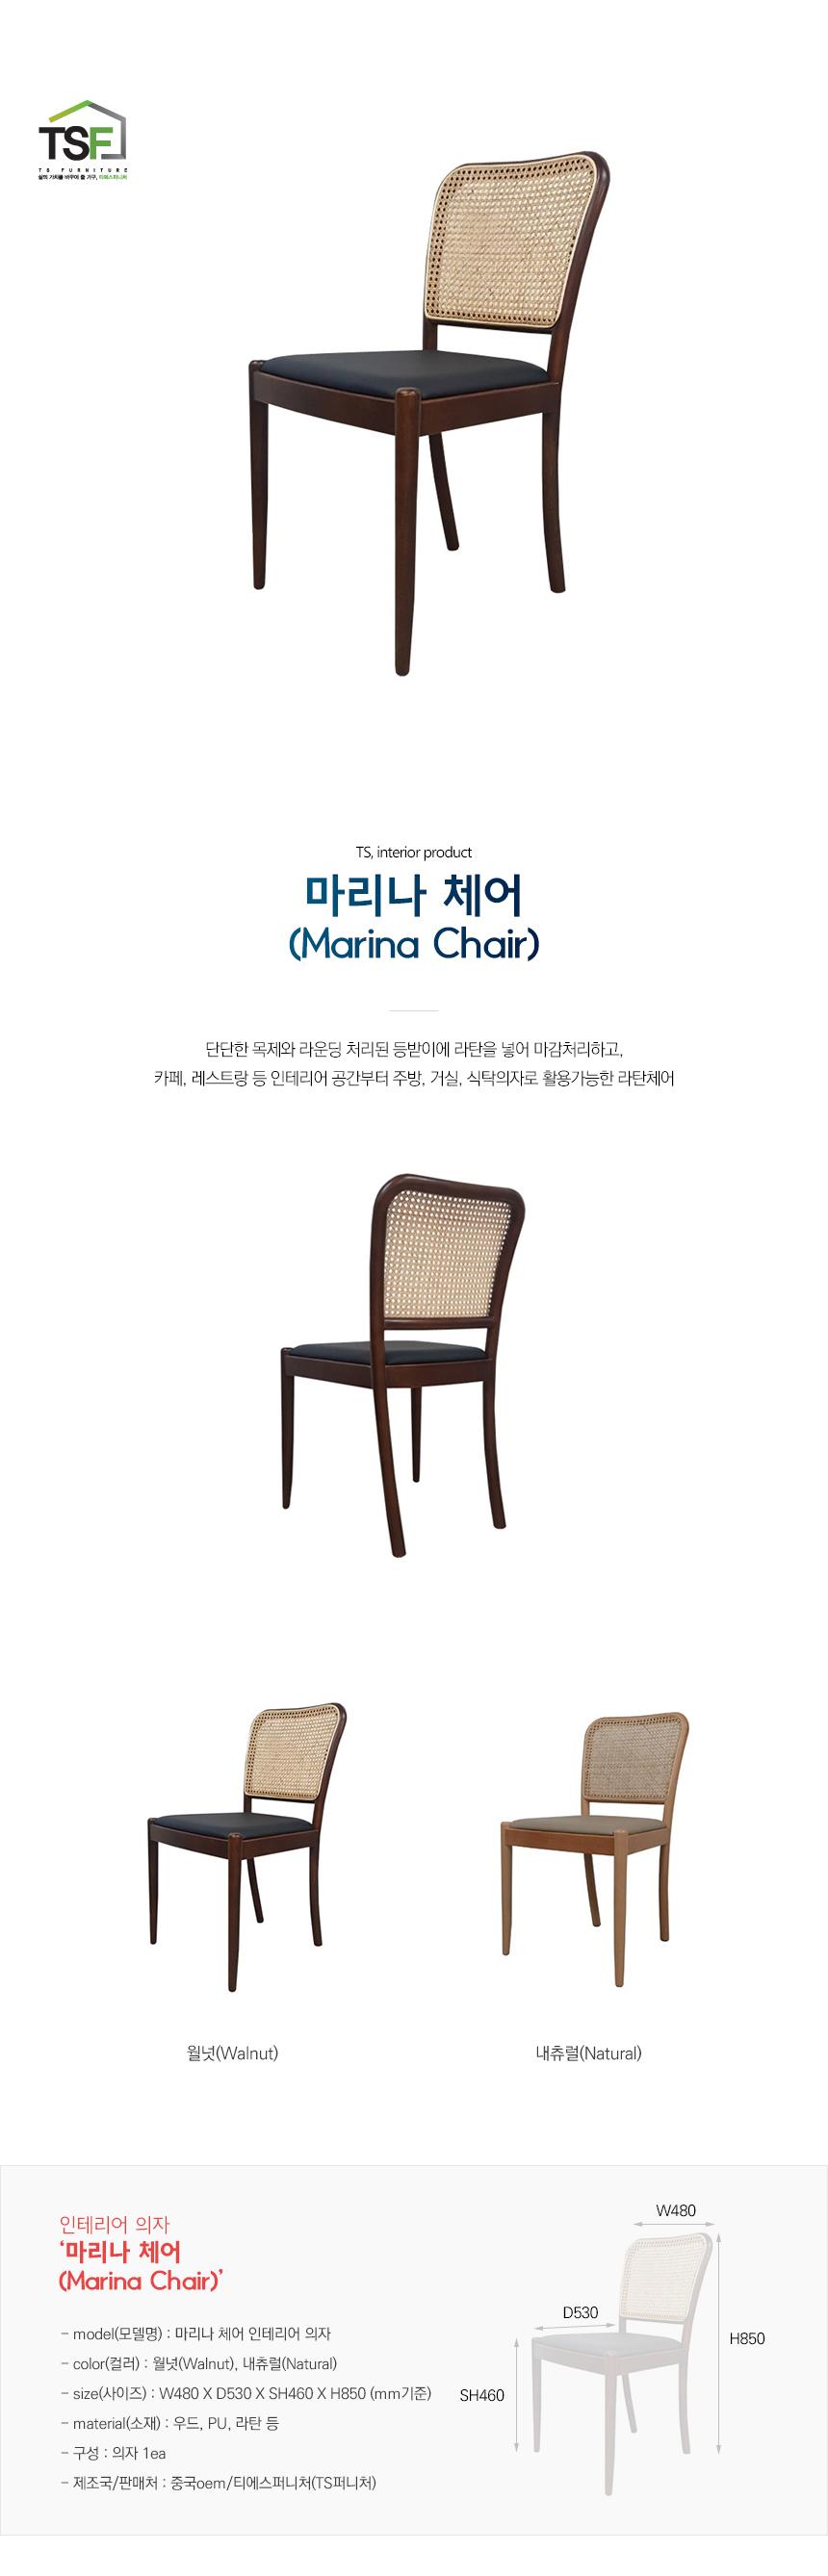 I 마리나 체어 인테리어 의자 - 주식회사 티에스퍼니처, 155,500원, 디자인 의자, 스틸의자